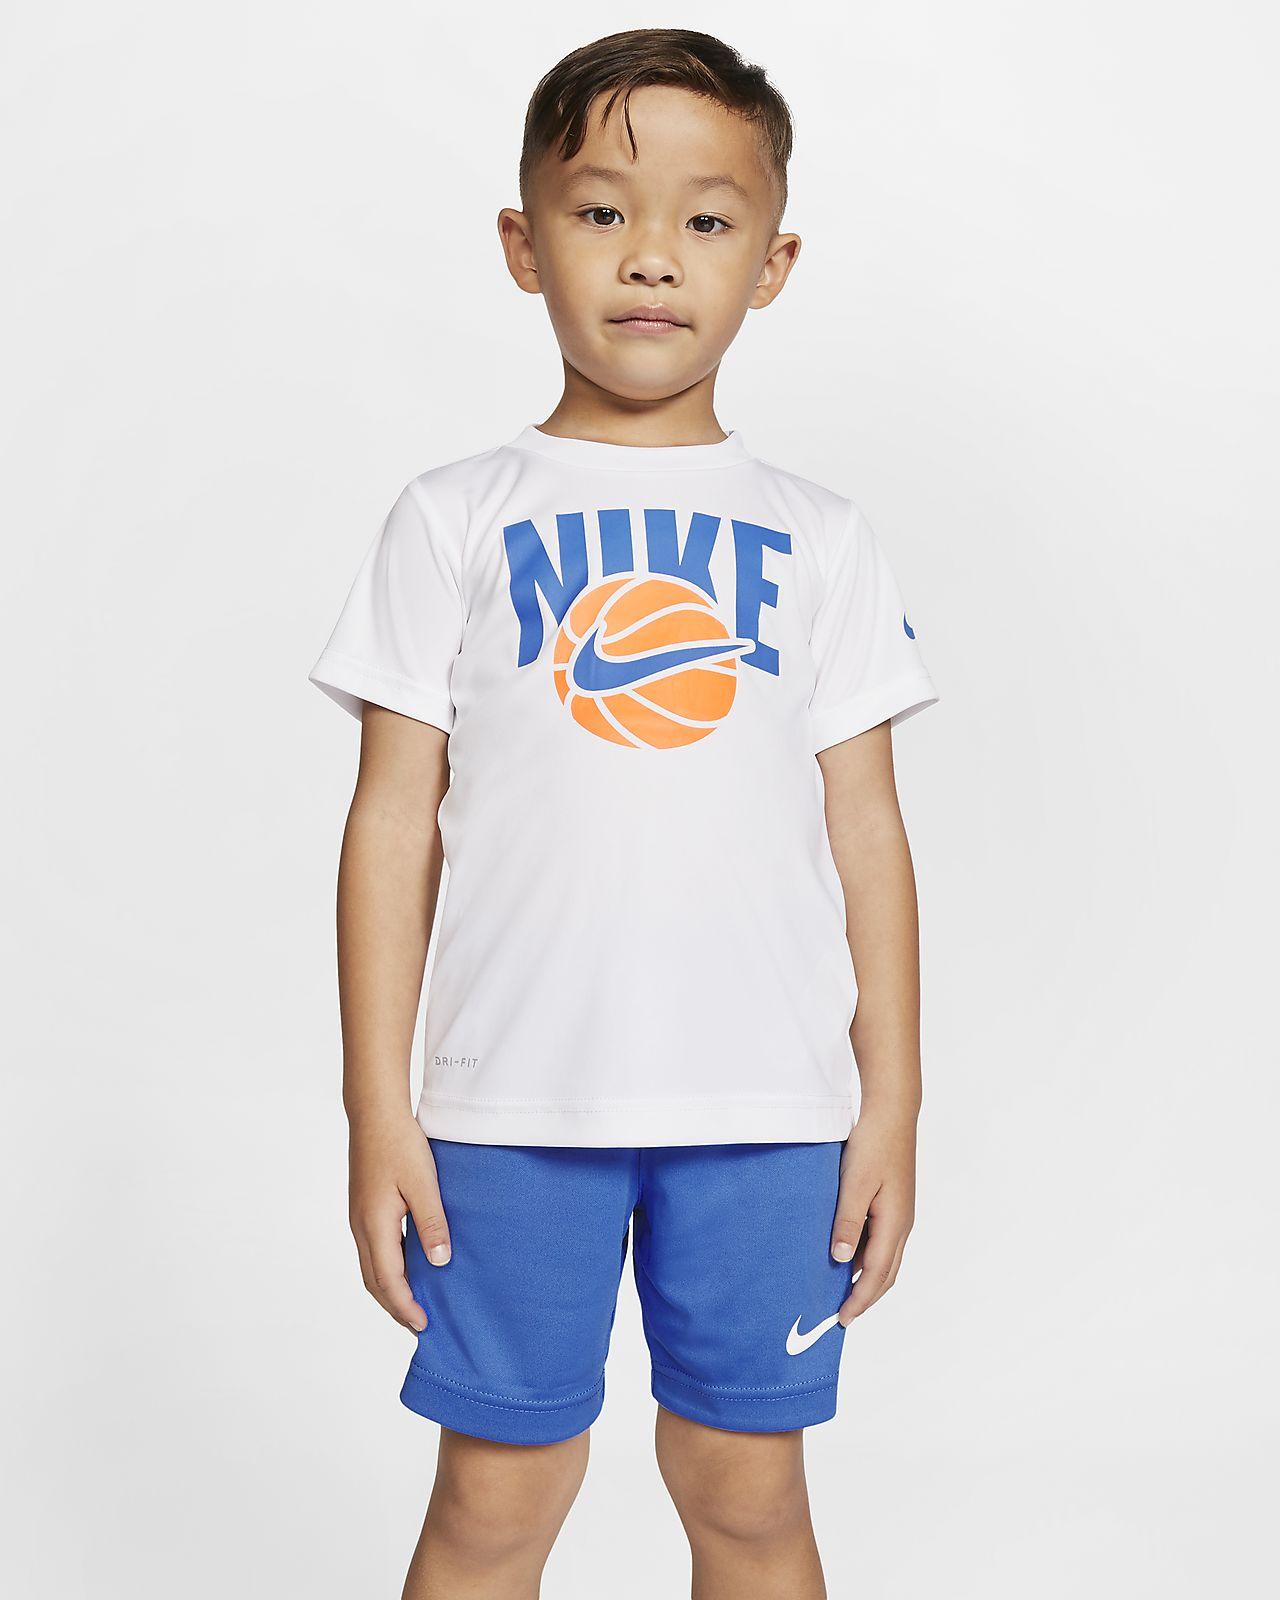 Nike Dri-FIT Toddler T-Shirt and Shorts Set